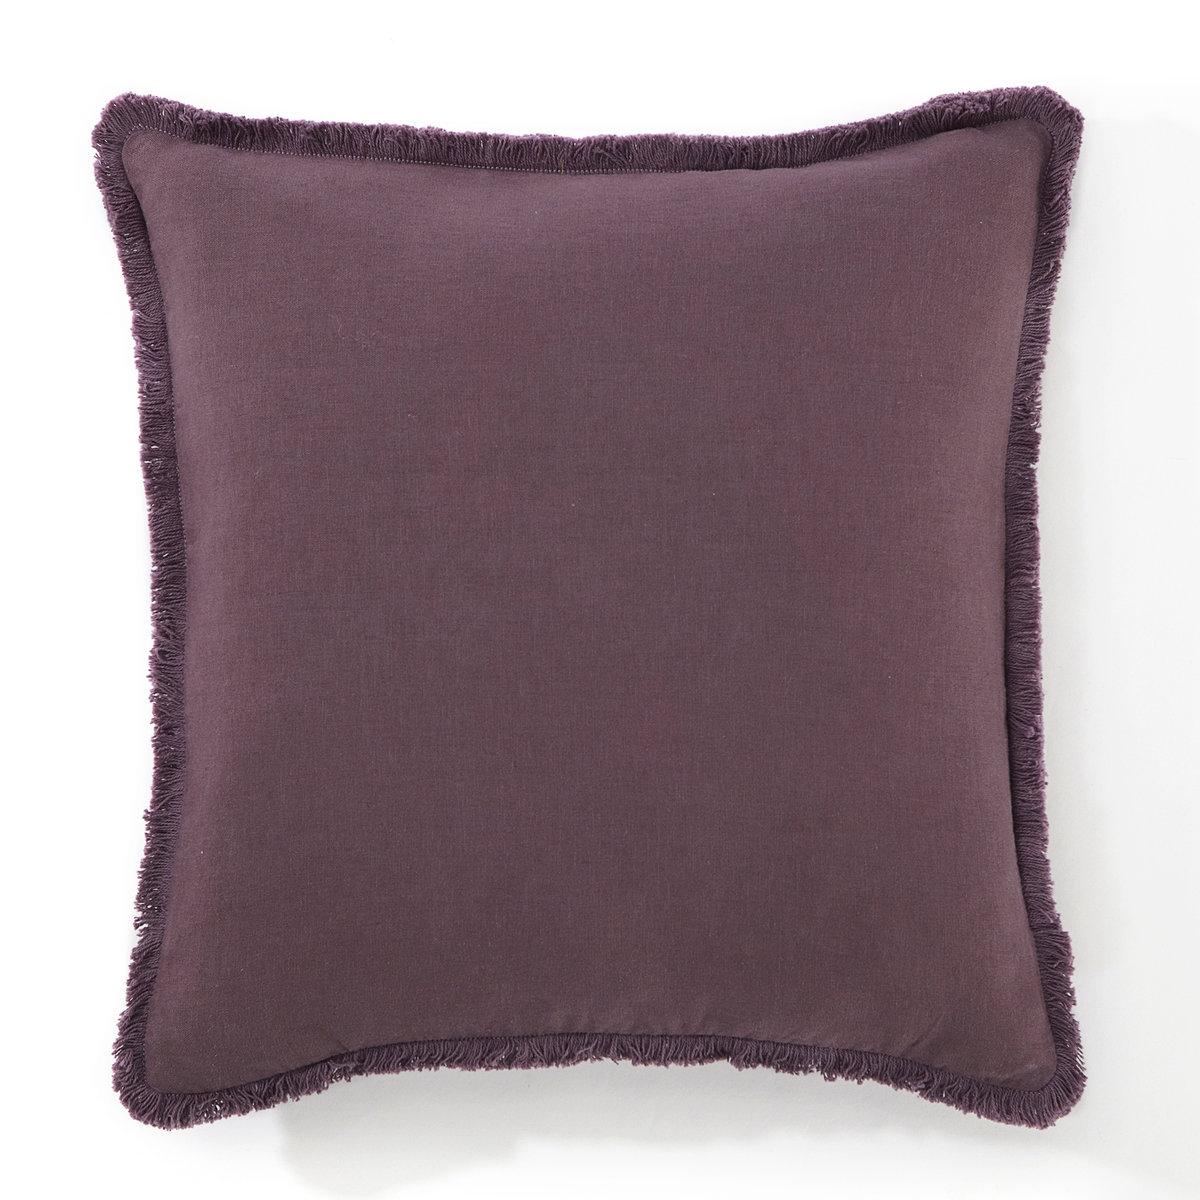 Чехол для подушки из льна/вискозы Odorie